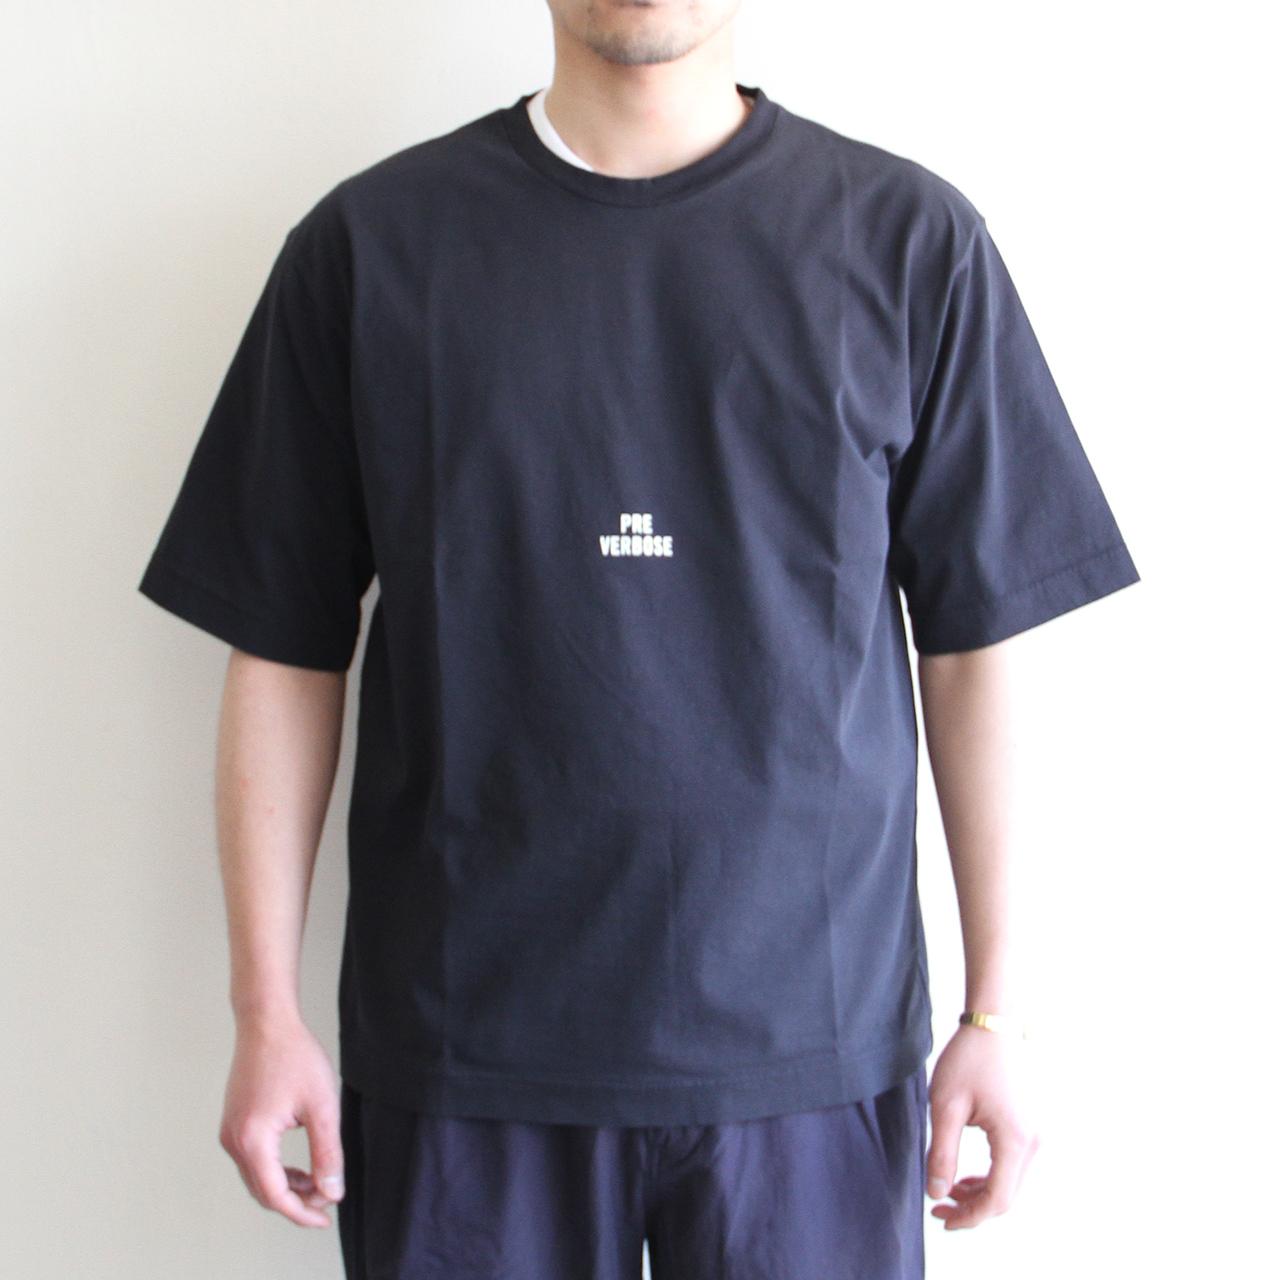 STILL BY HAND【 mens 】 crew neck tee